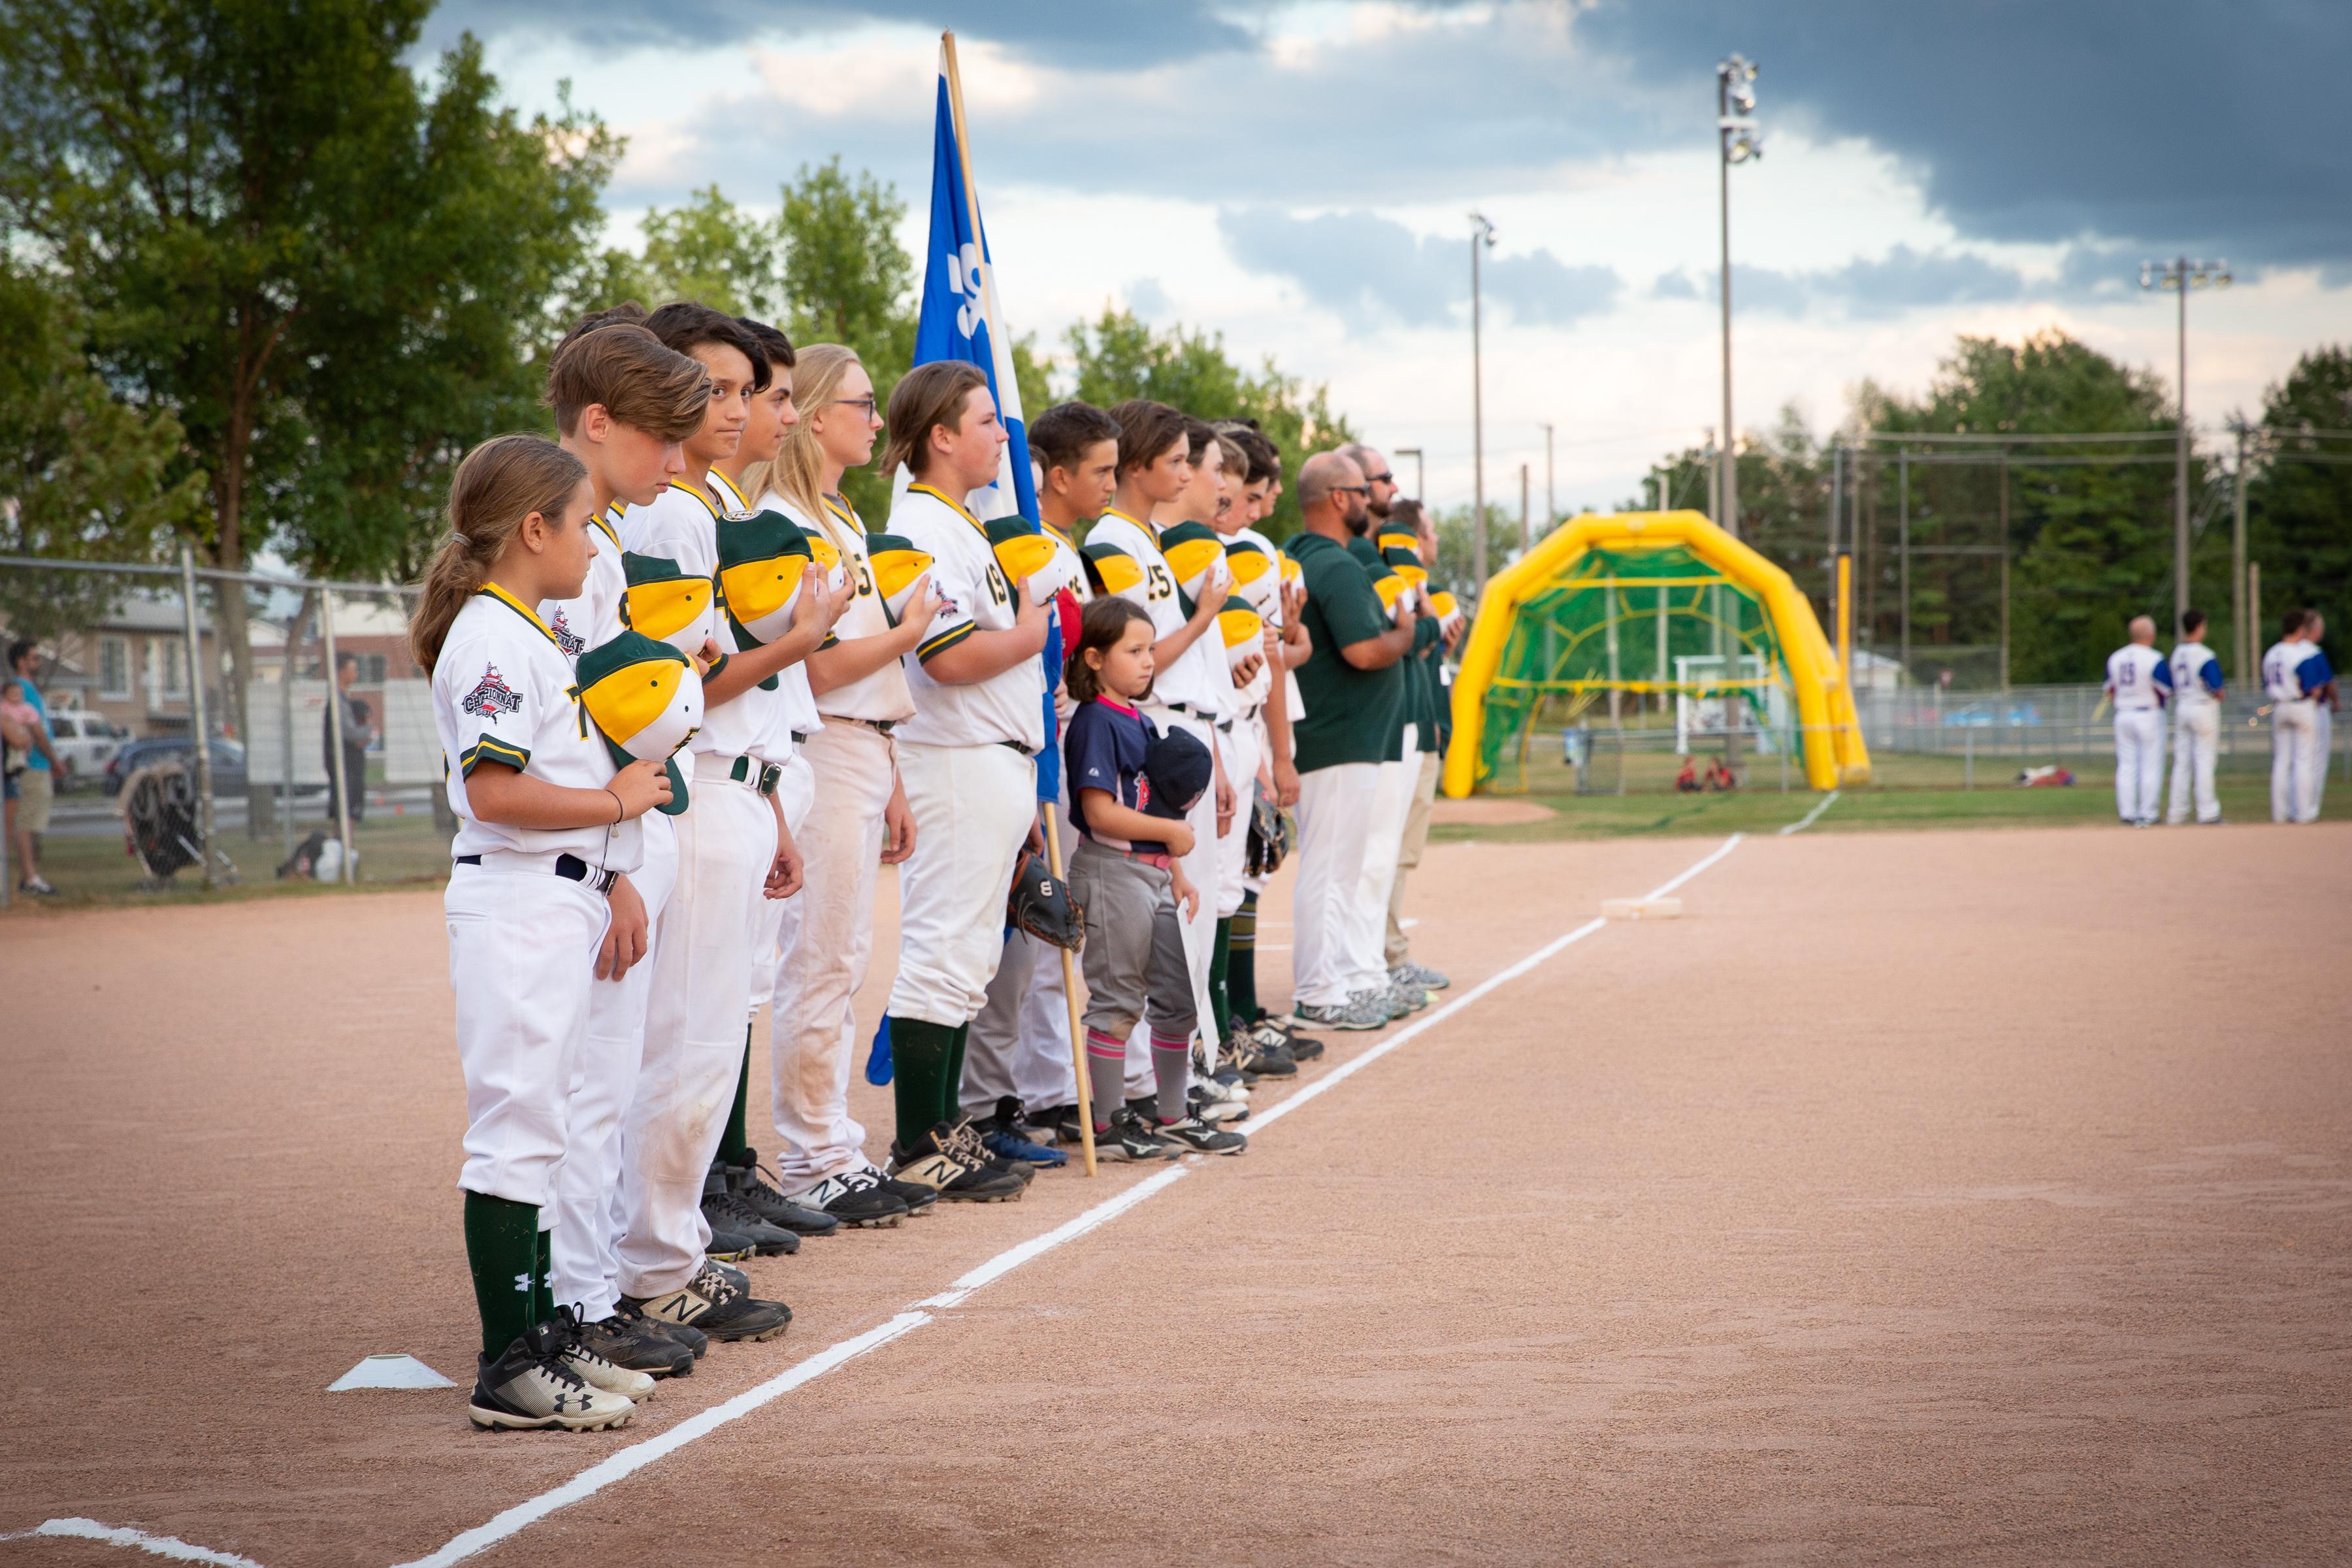 Baseball Le Gardeur